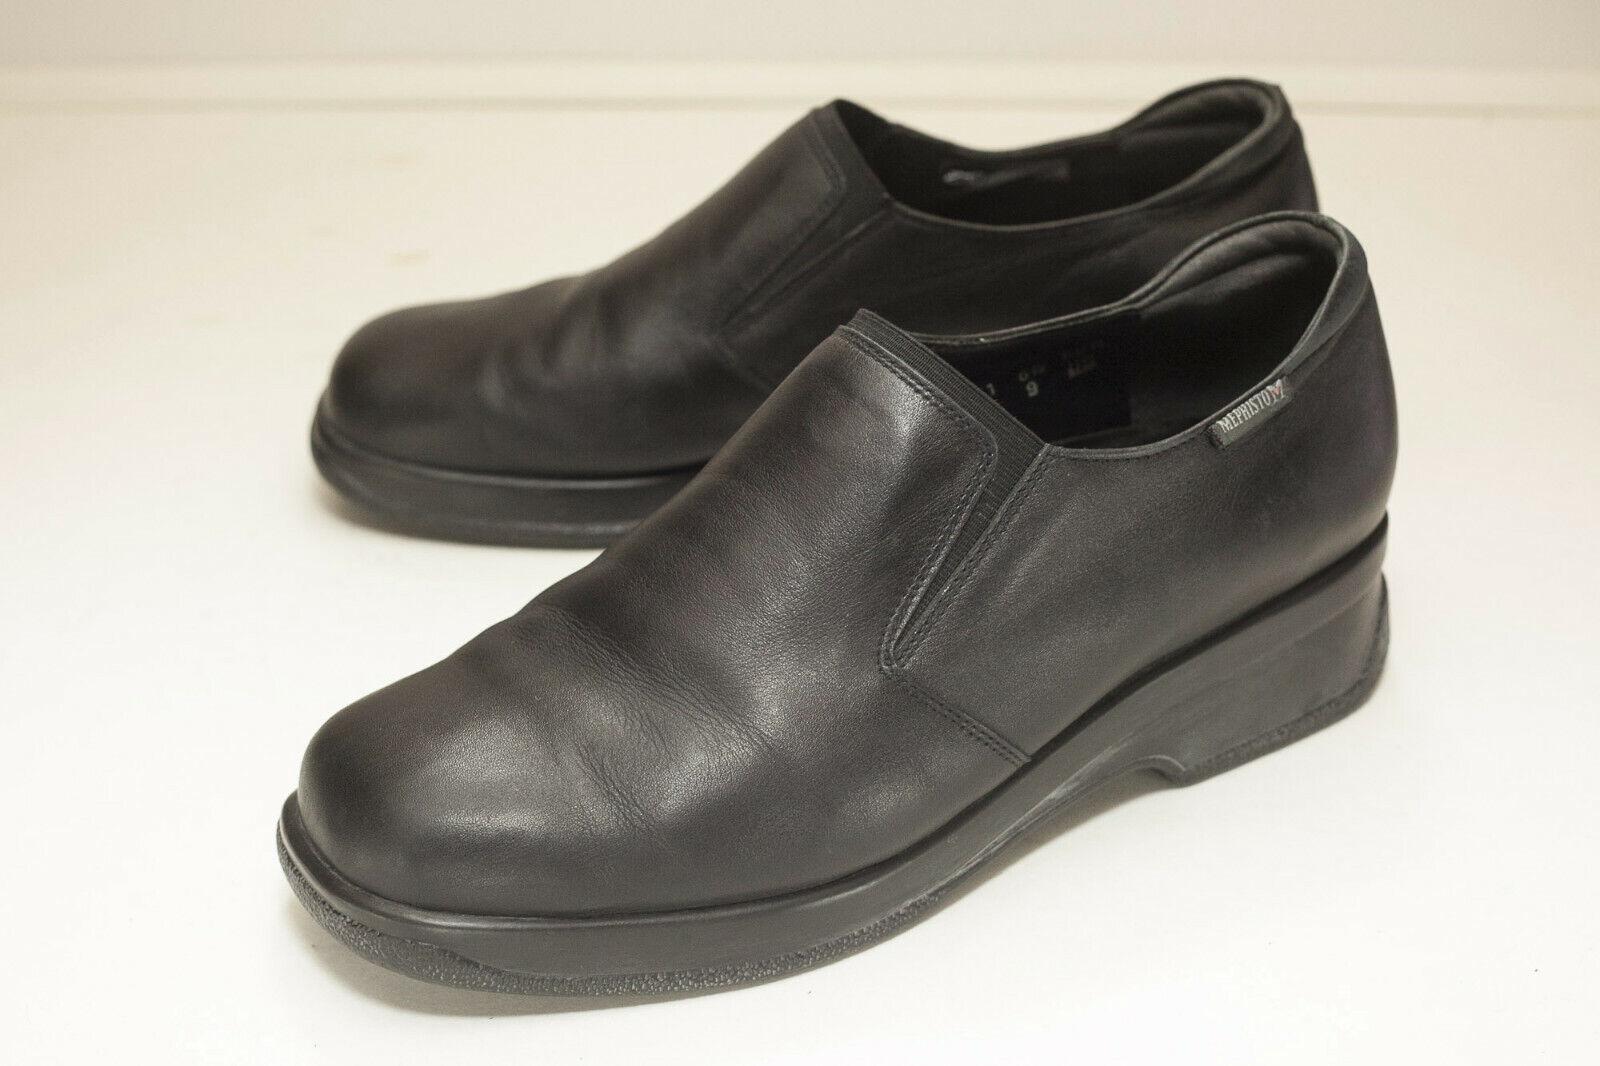 Mephisto US 9 Black Slip On Loafers Women's UK 6.5